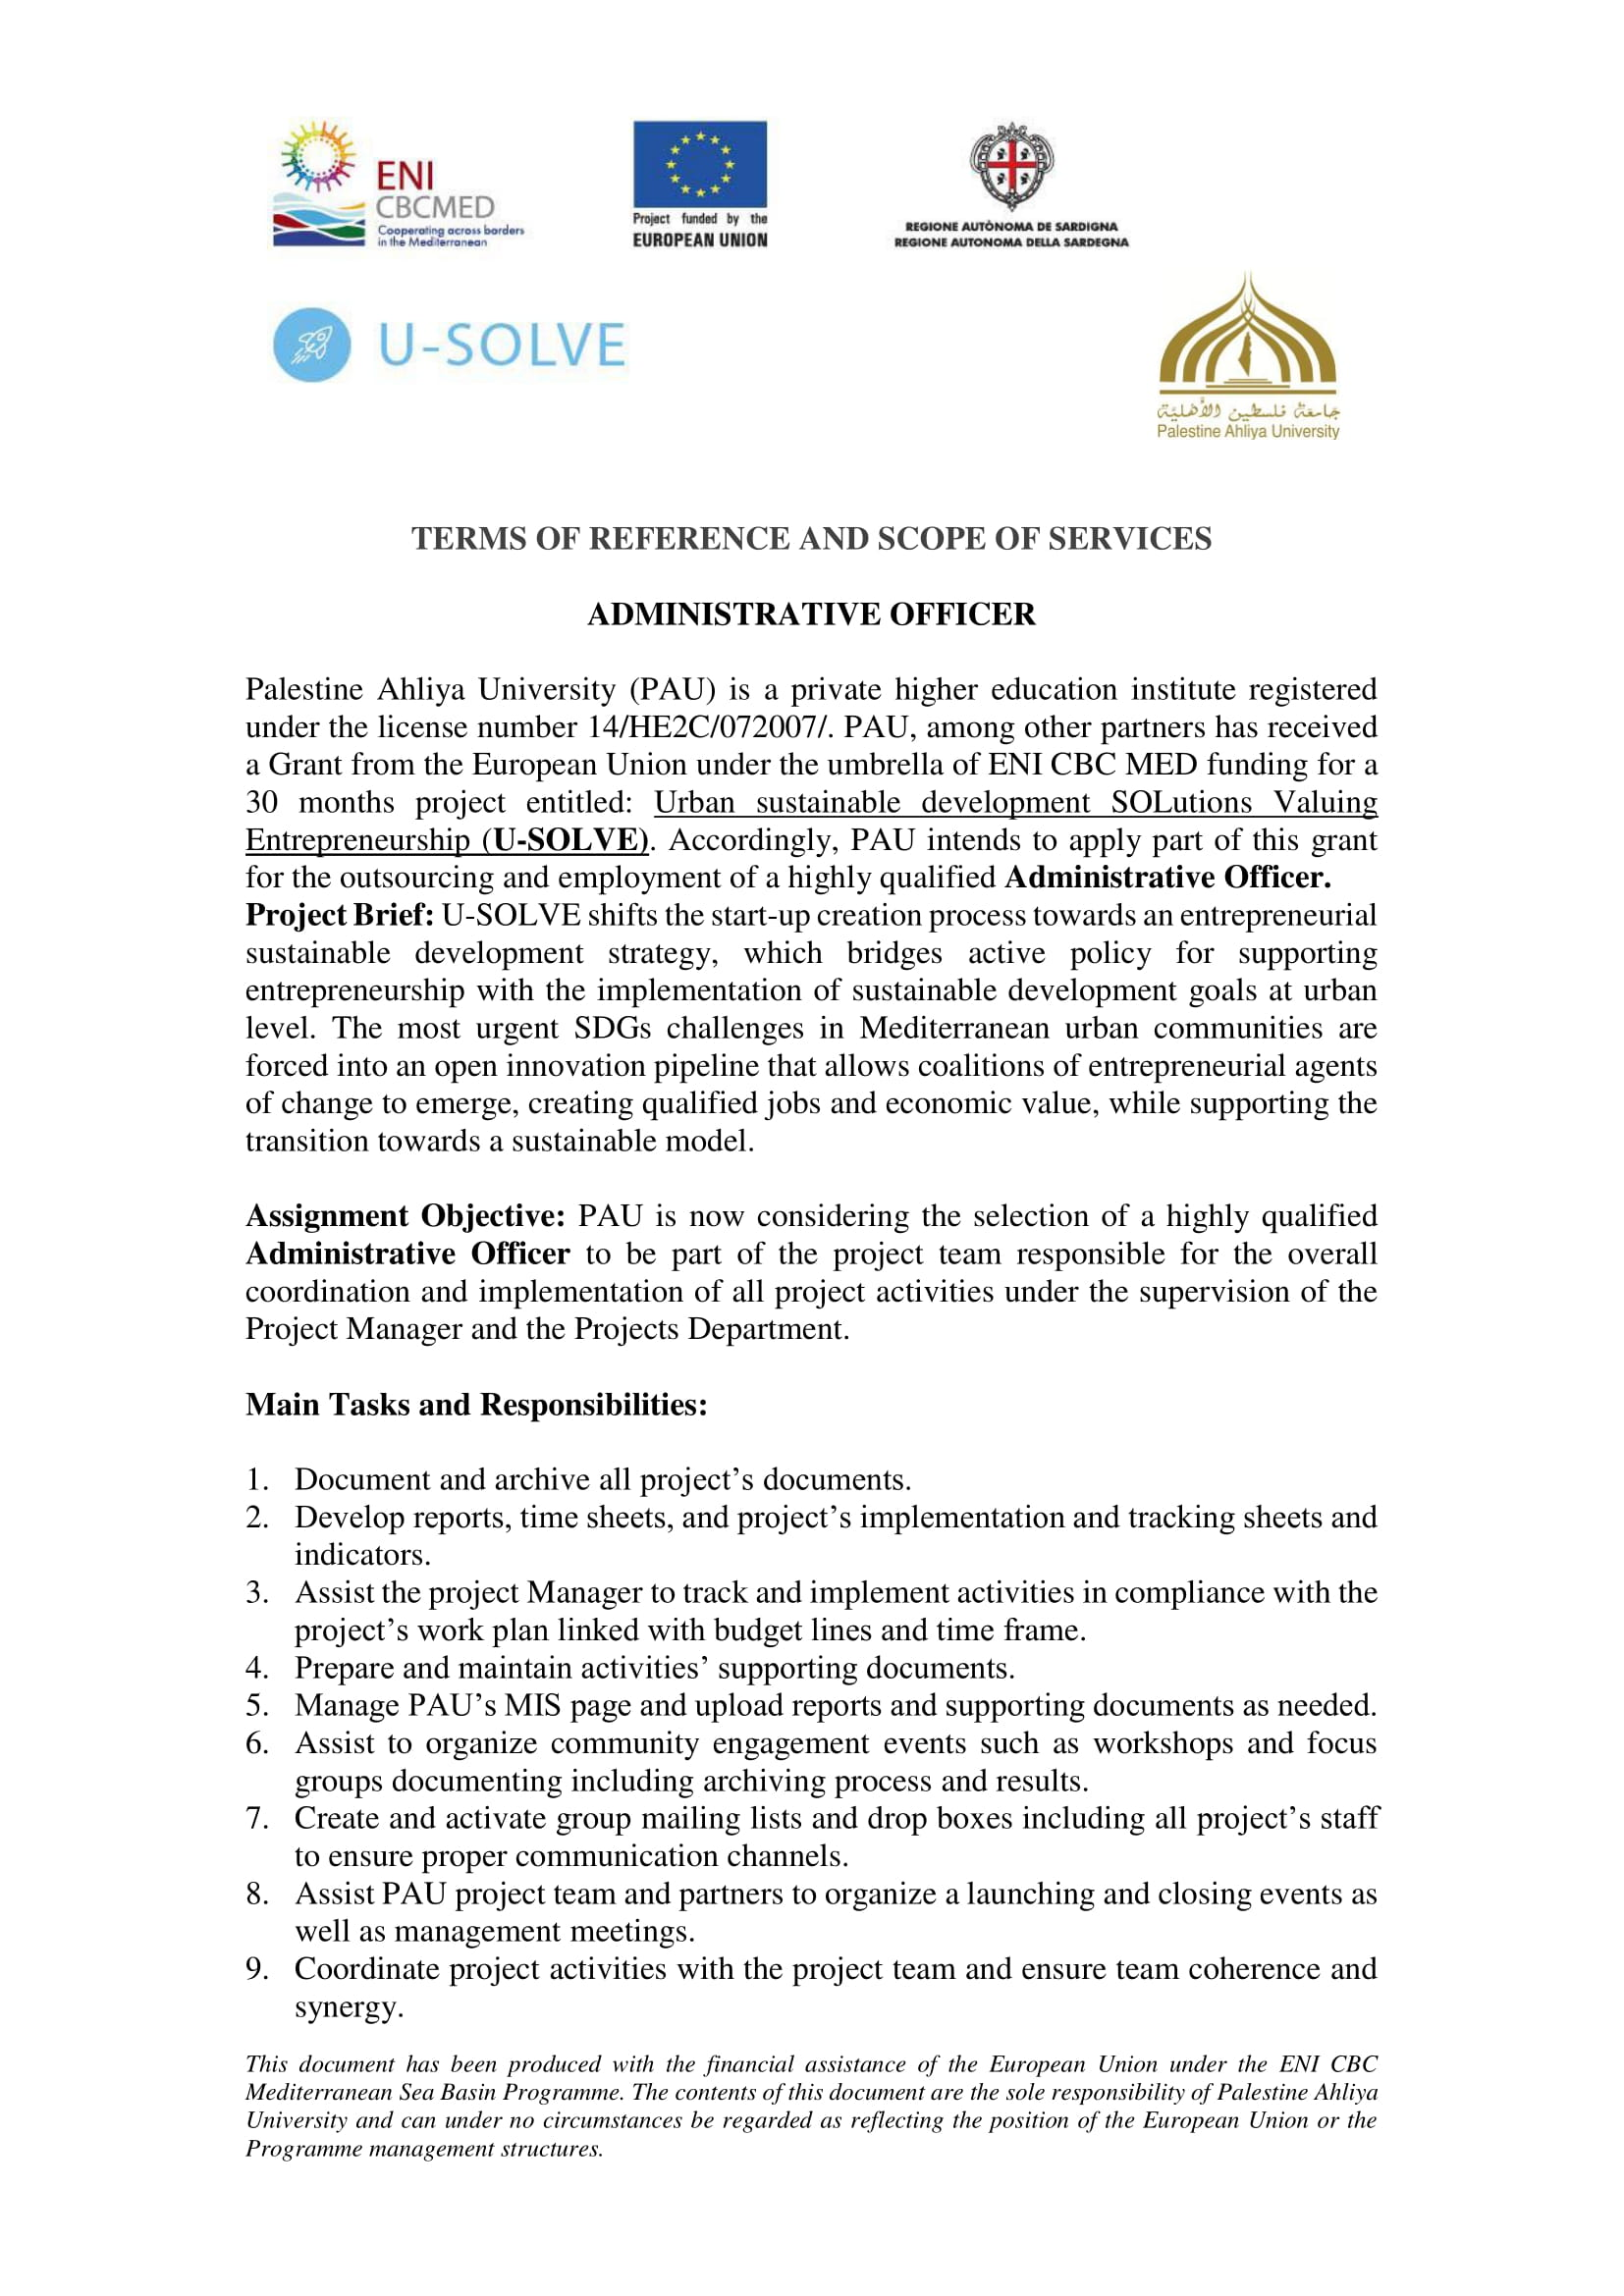 TOR administrative assistant- U-SOLVE